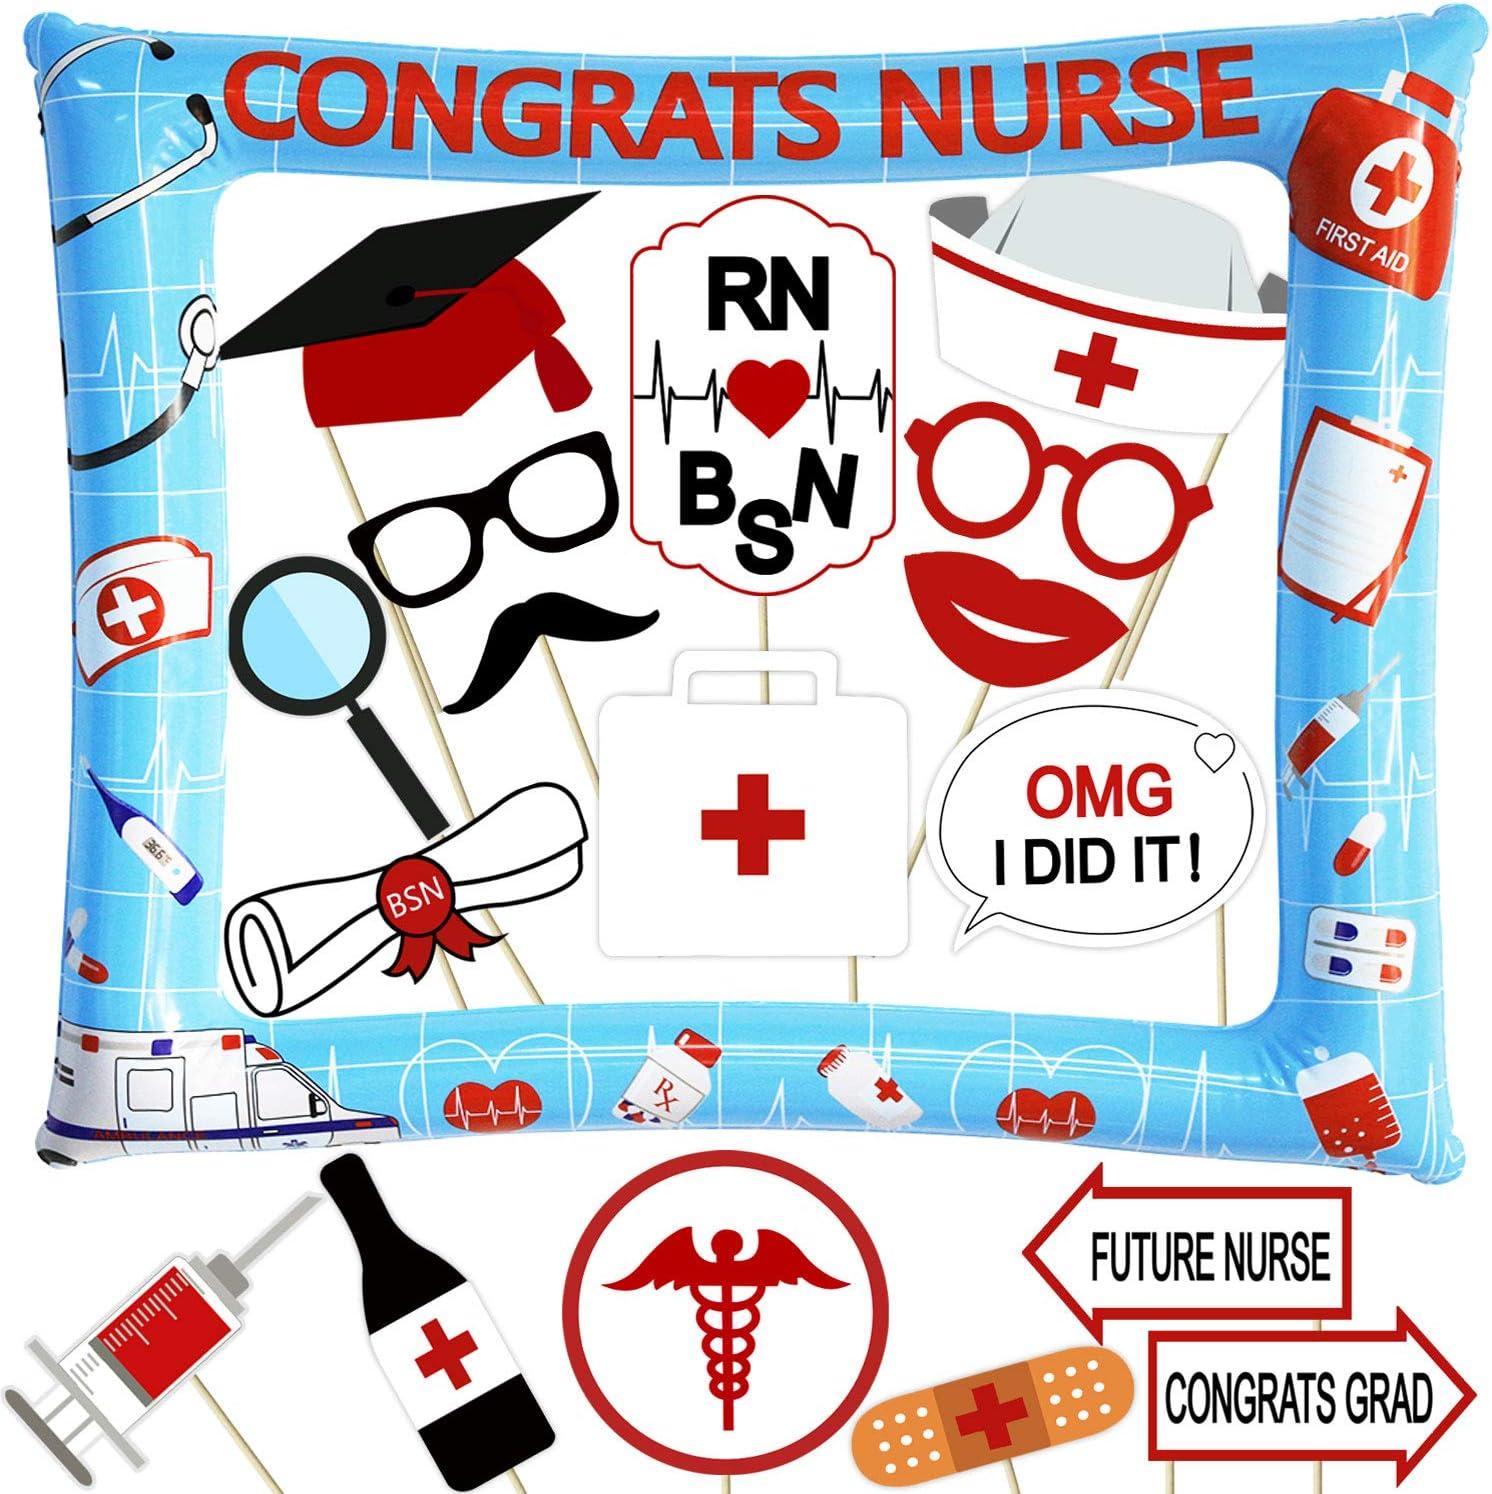 42 Piece Nurse Graduation Photo Booth Props Red Glitter Great Graduation Decorations For 2019 Doctor Nurse Graduation Theme Party Supplies